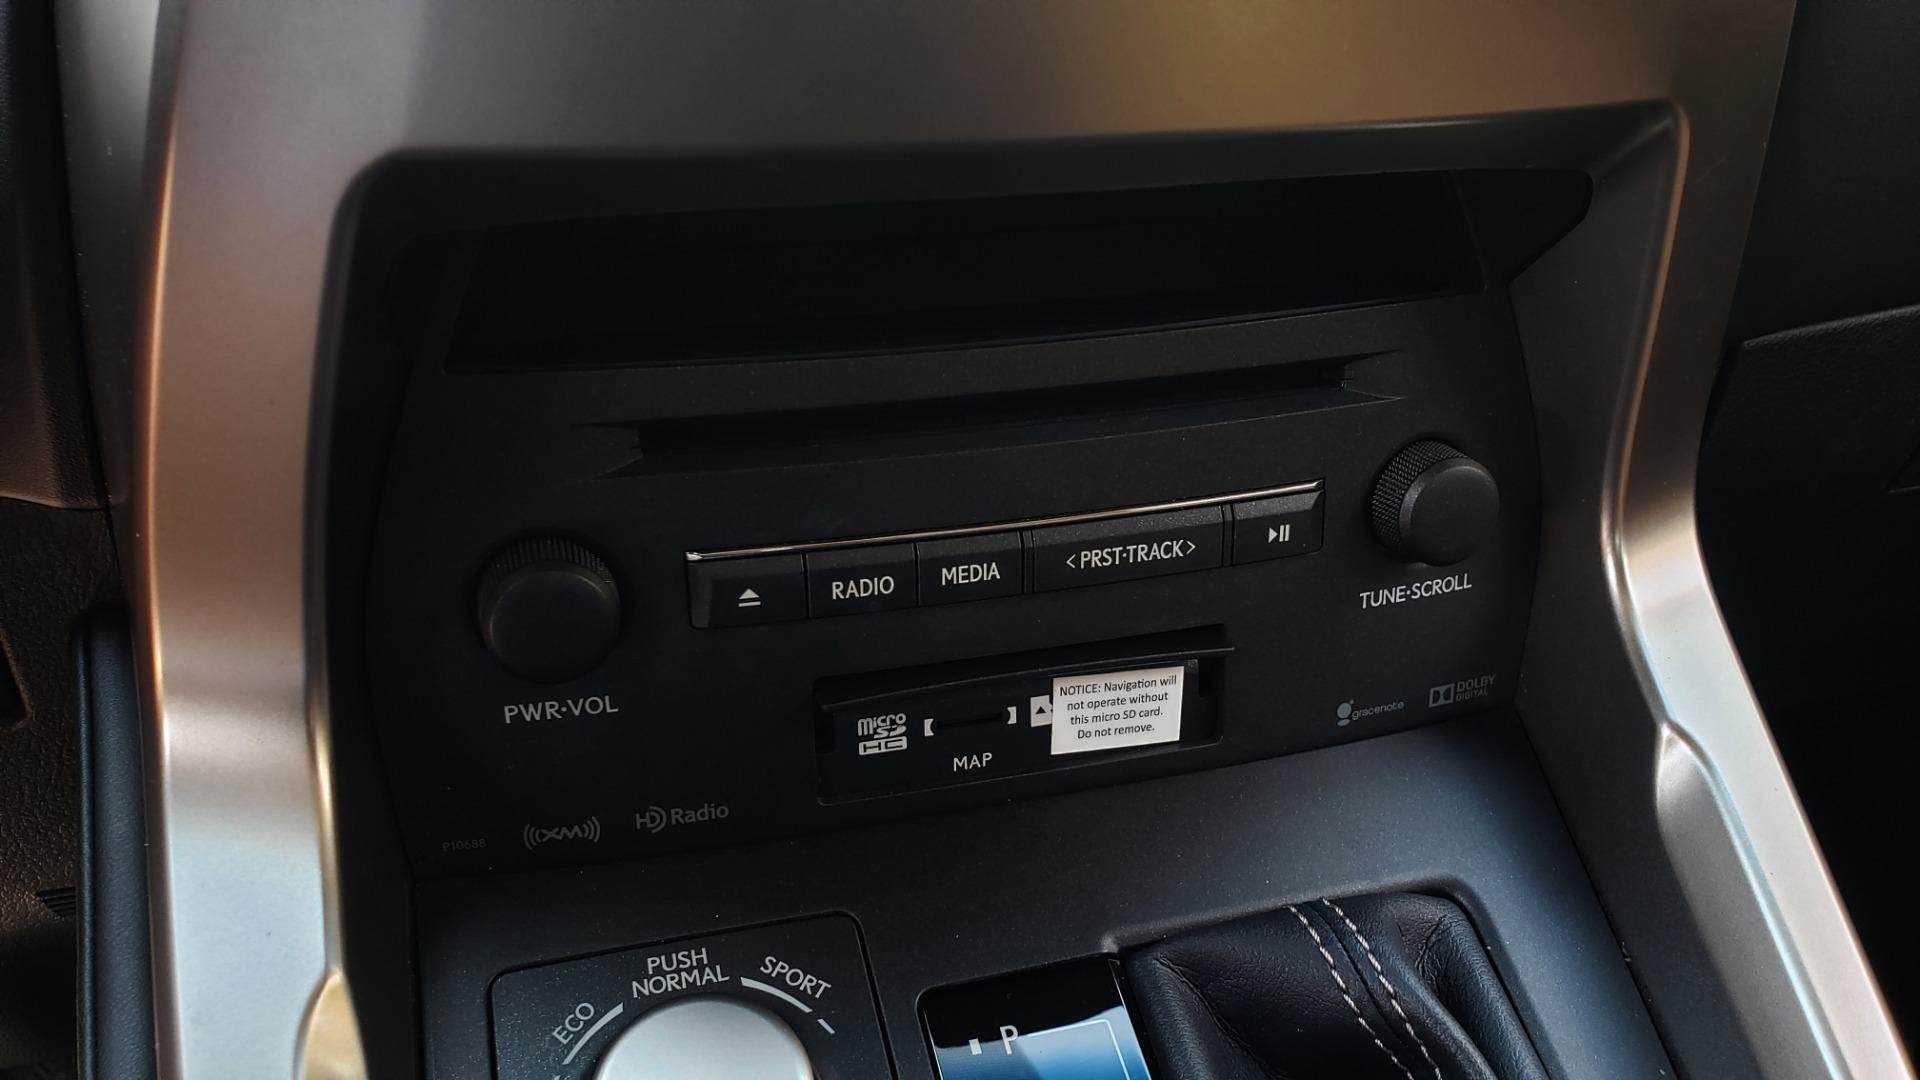 Used 2016 Lexus NX 200T PREM PKG / NAV / SUNROOF / PRE-COLLISION / PARK ASST for sale Sold at Formula Imports in Charlotte NC 28227 47